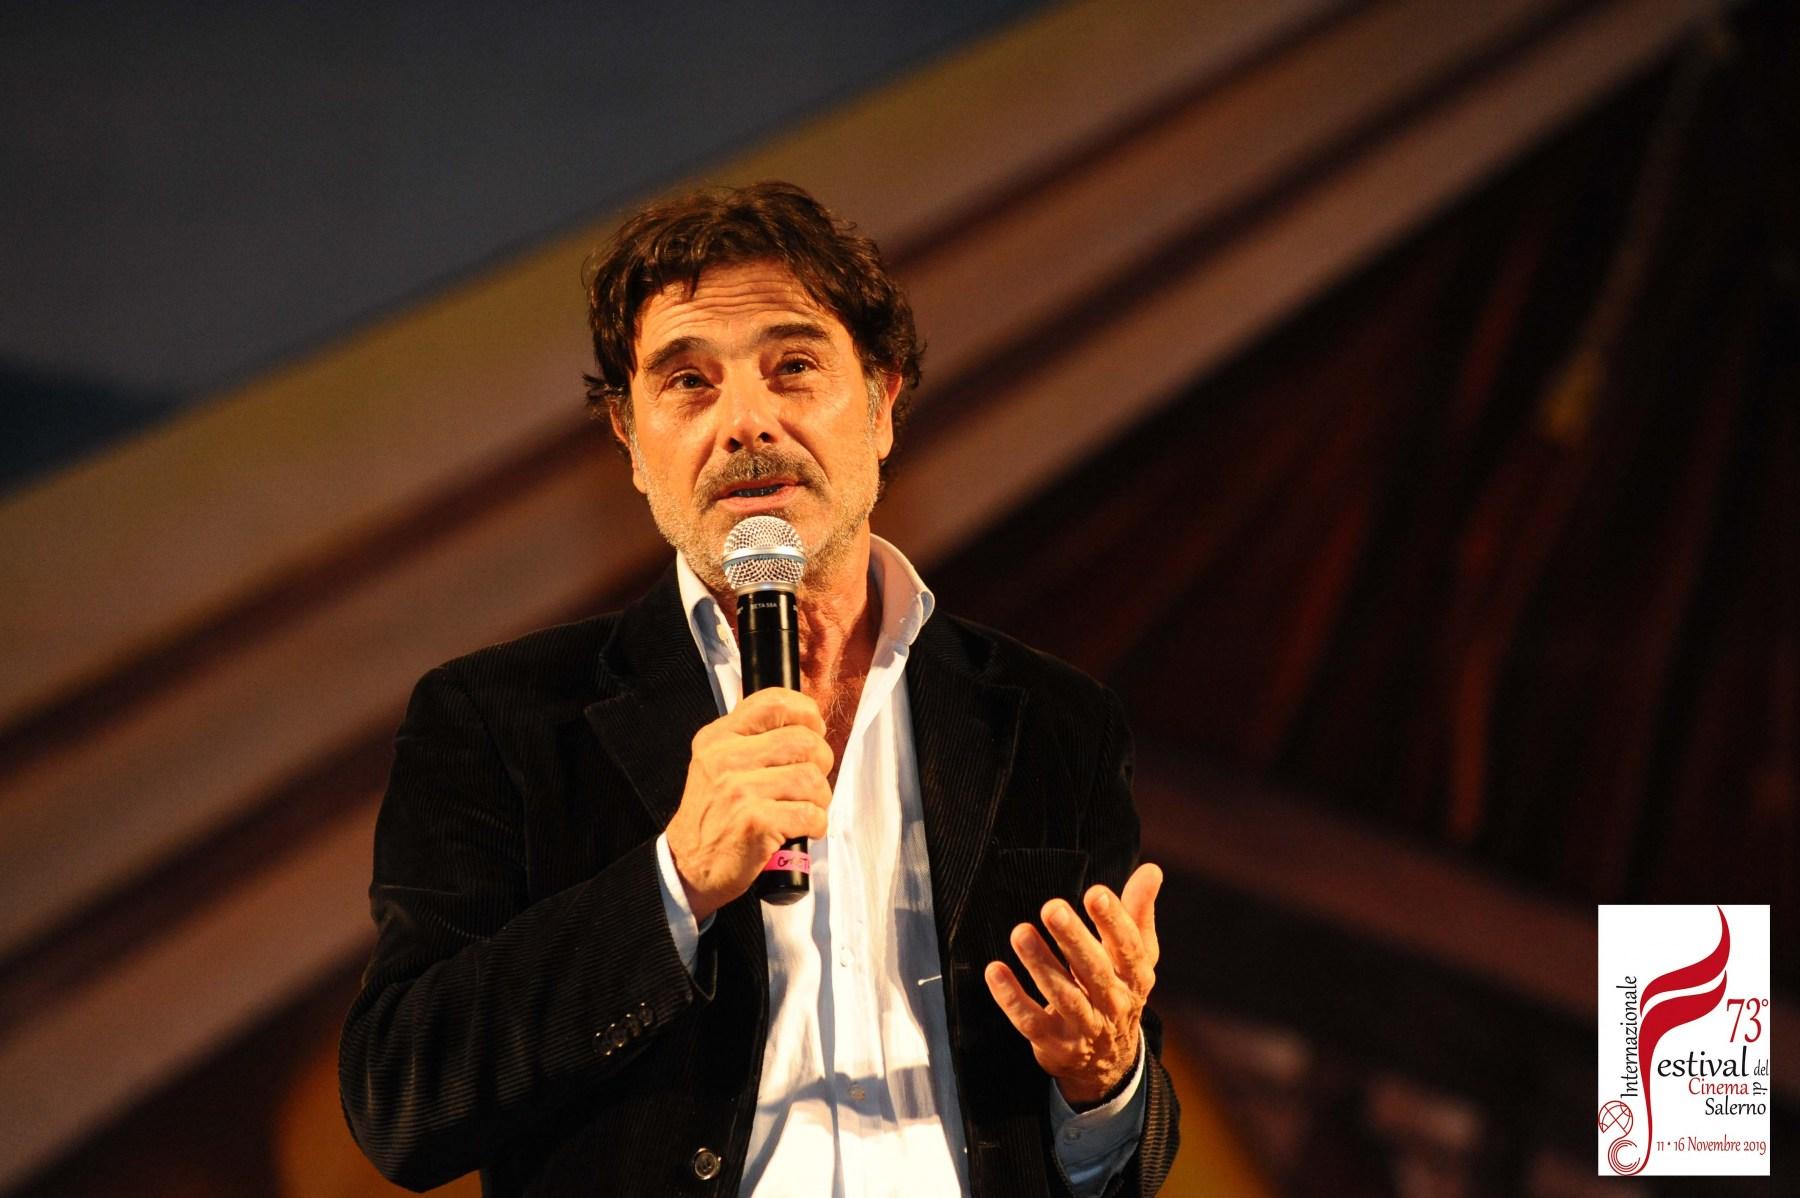 Adolfo-Margiotta